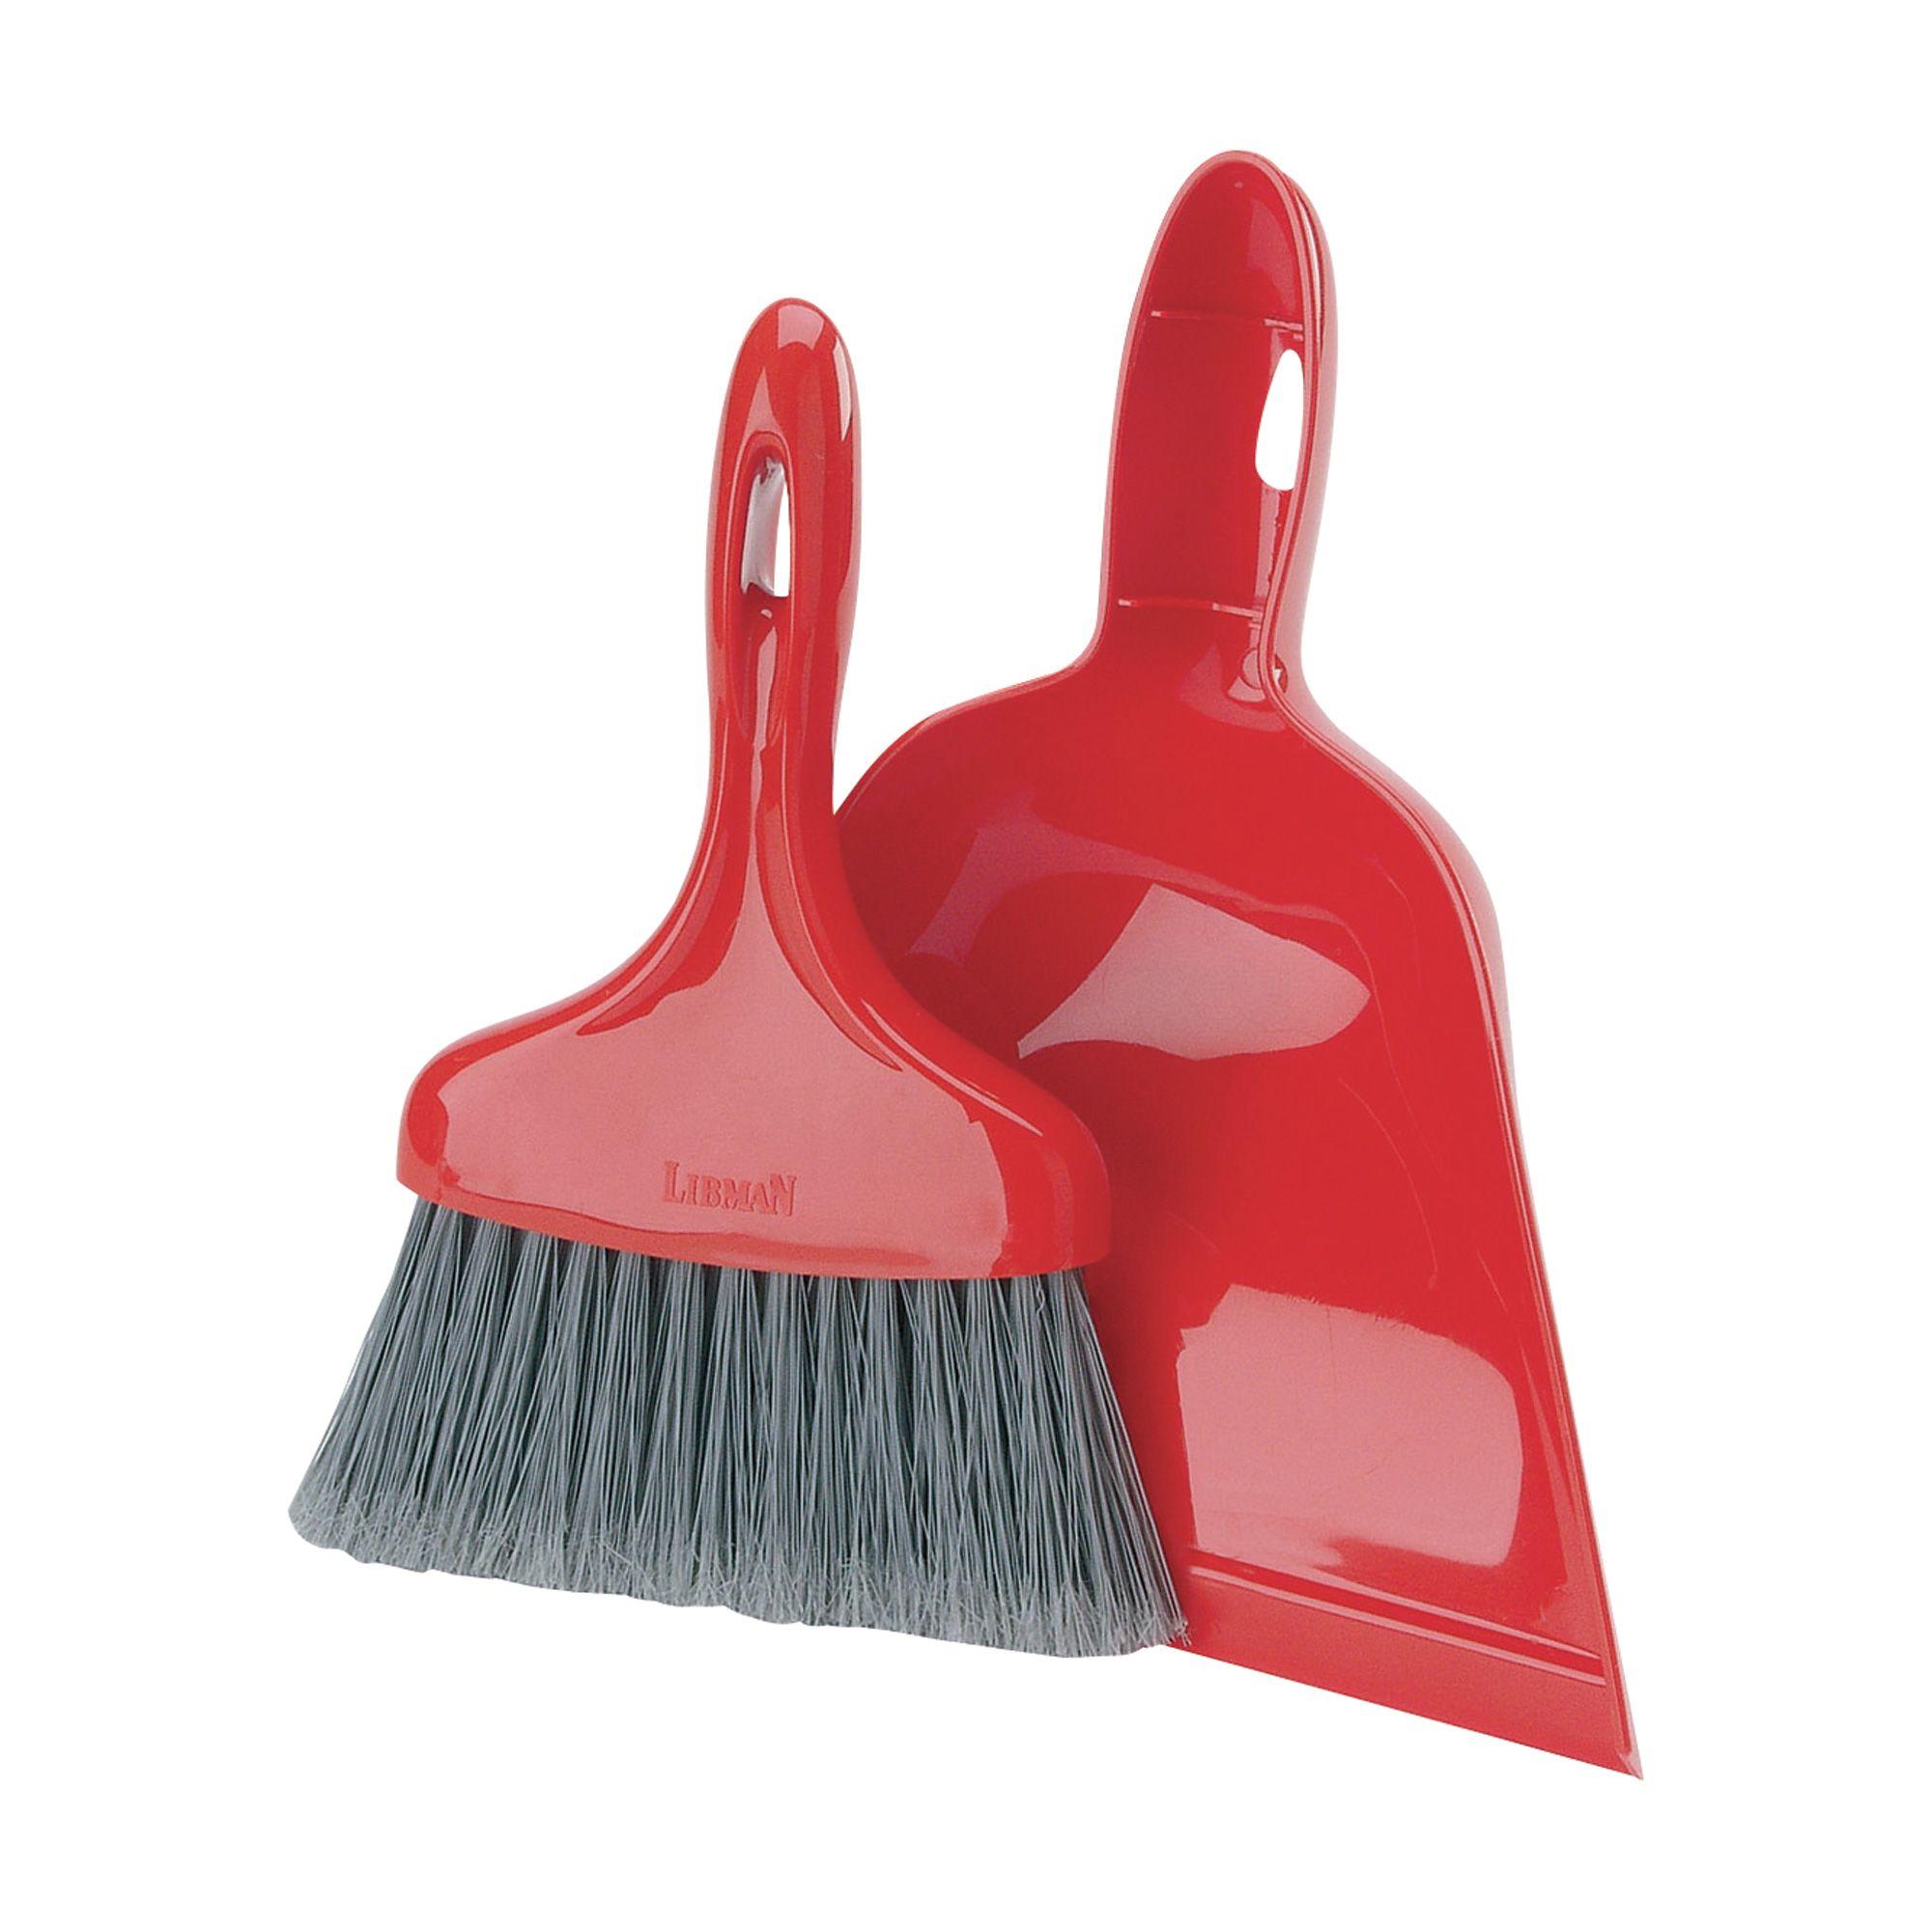 Hand Broom Camping Whisk Broom Broom Dustpan Push Broom